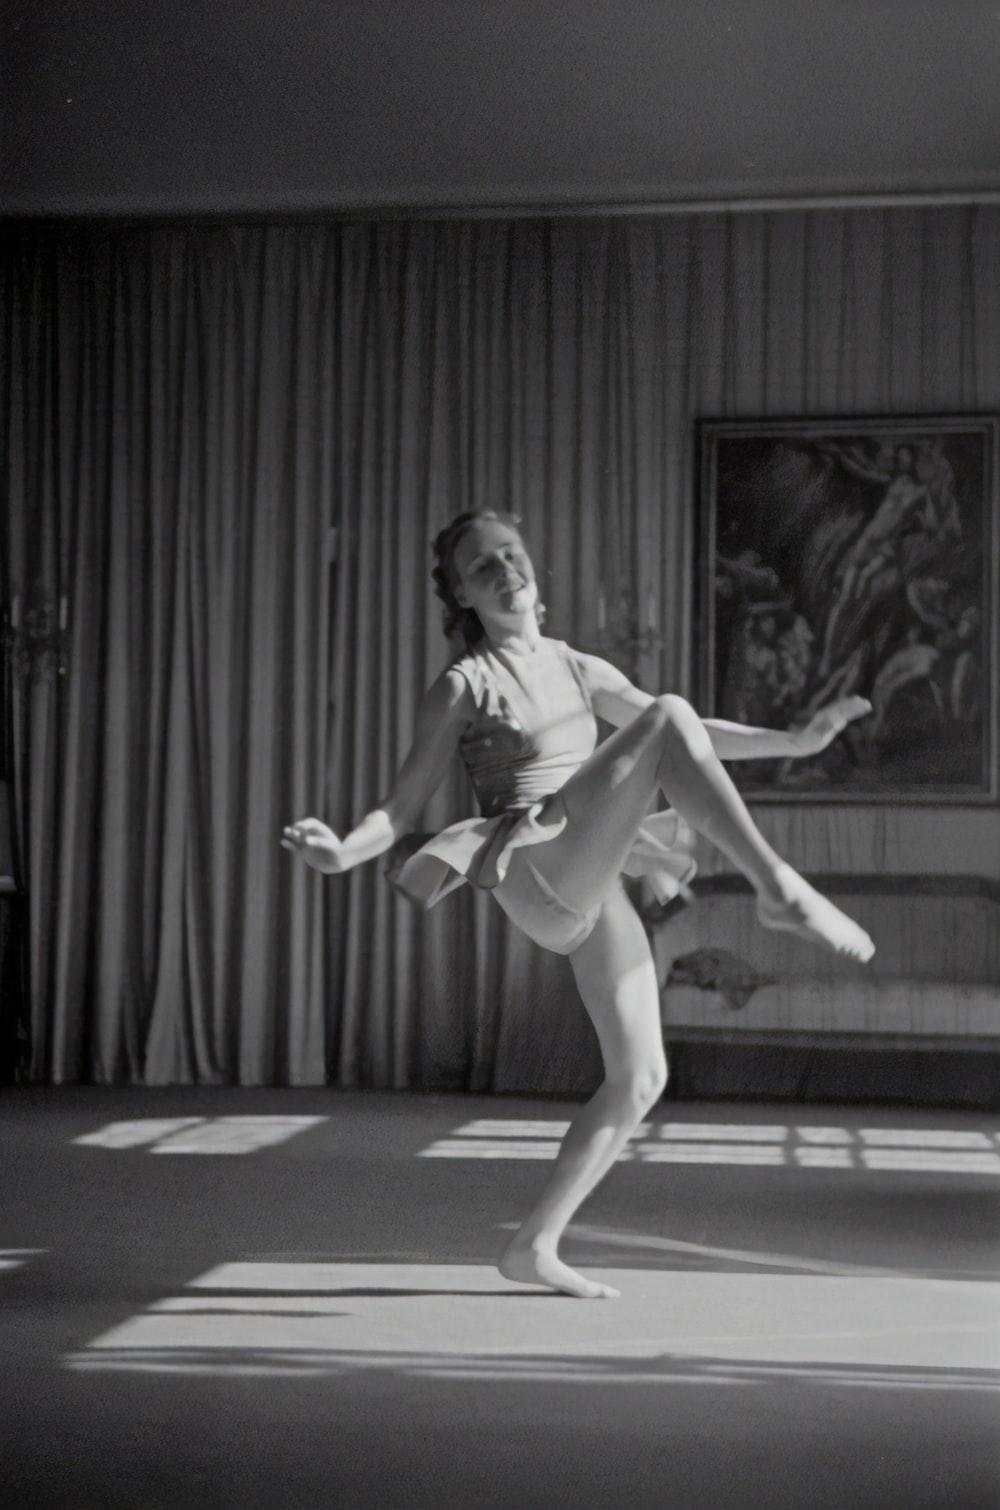 grayscale photo of woman dancing near curtain